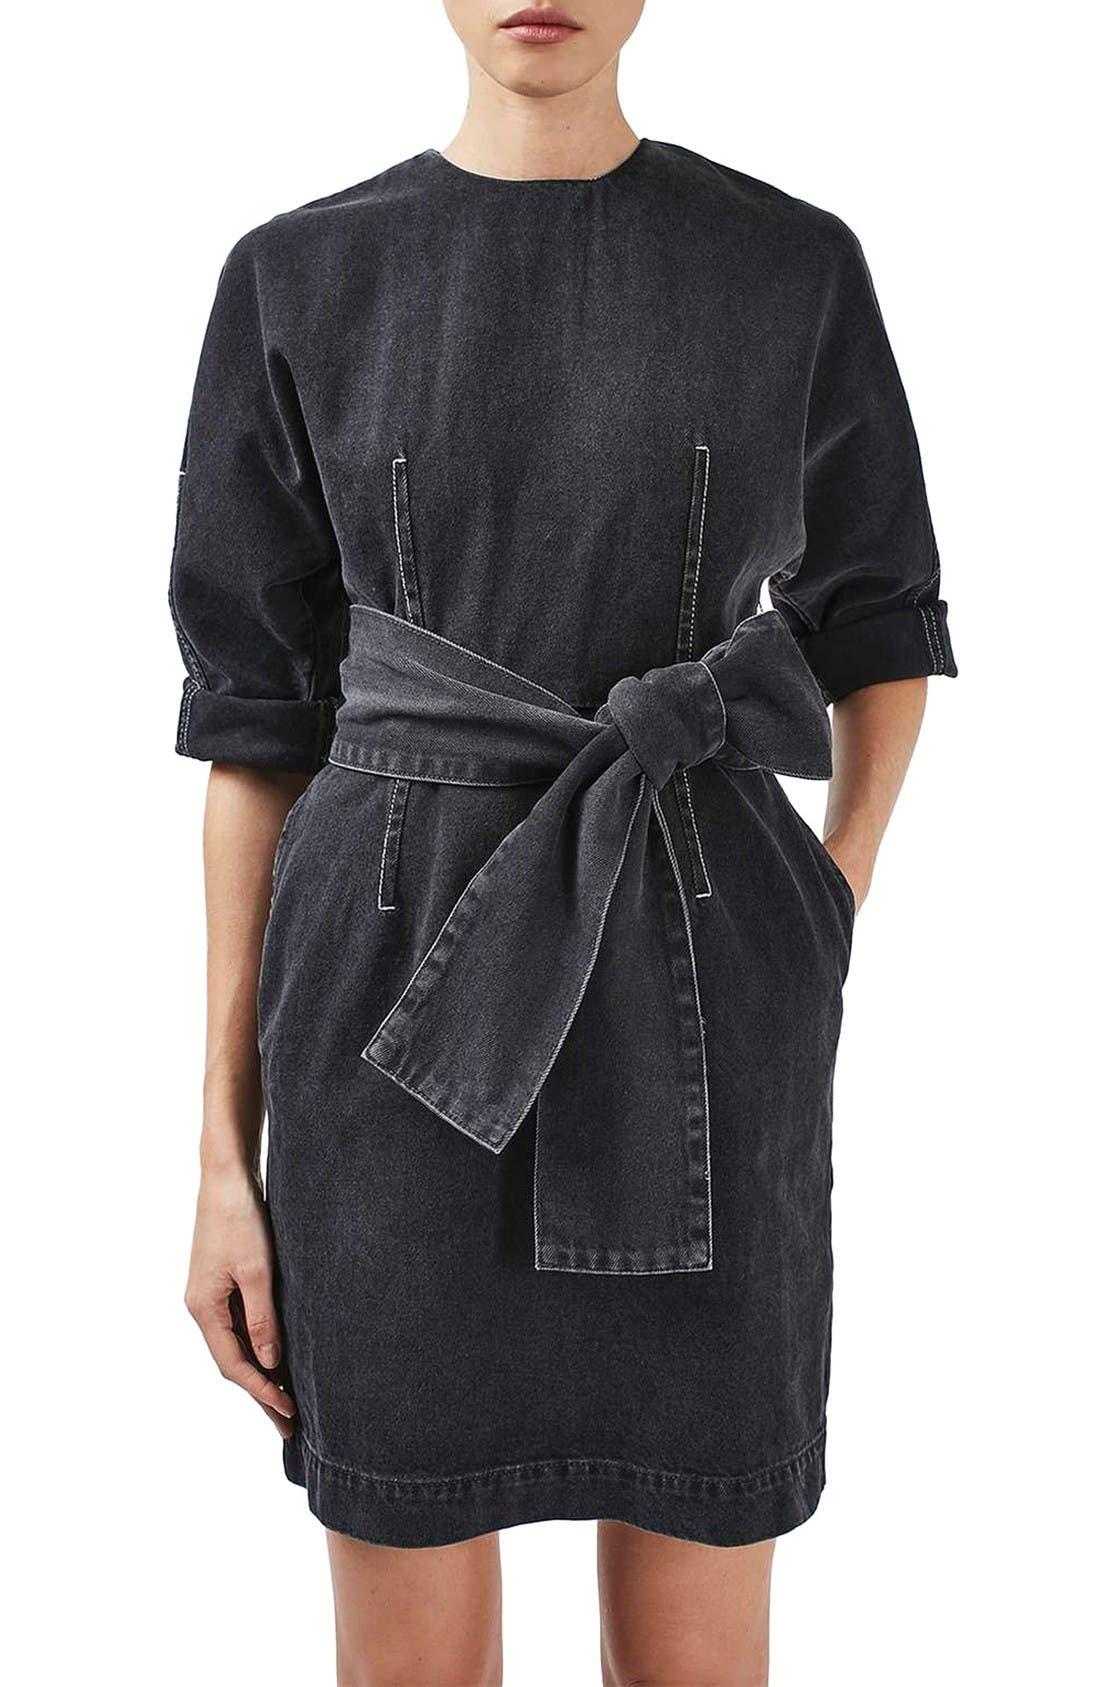 Alternate Image 1 Selected - Topshop Boutique Dome Denim Dress